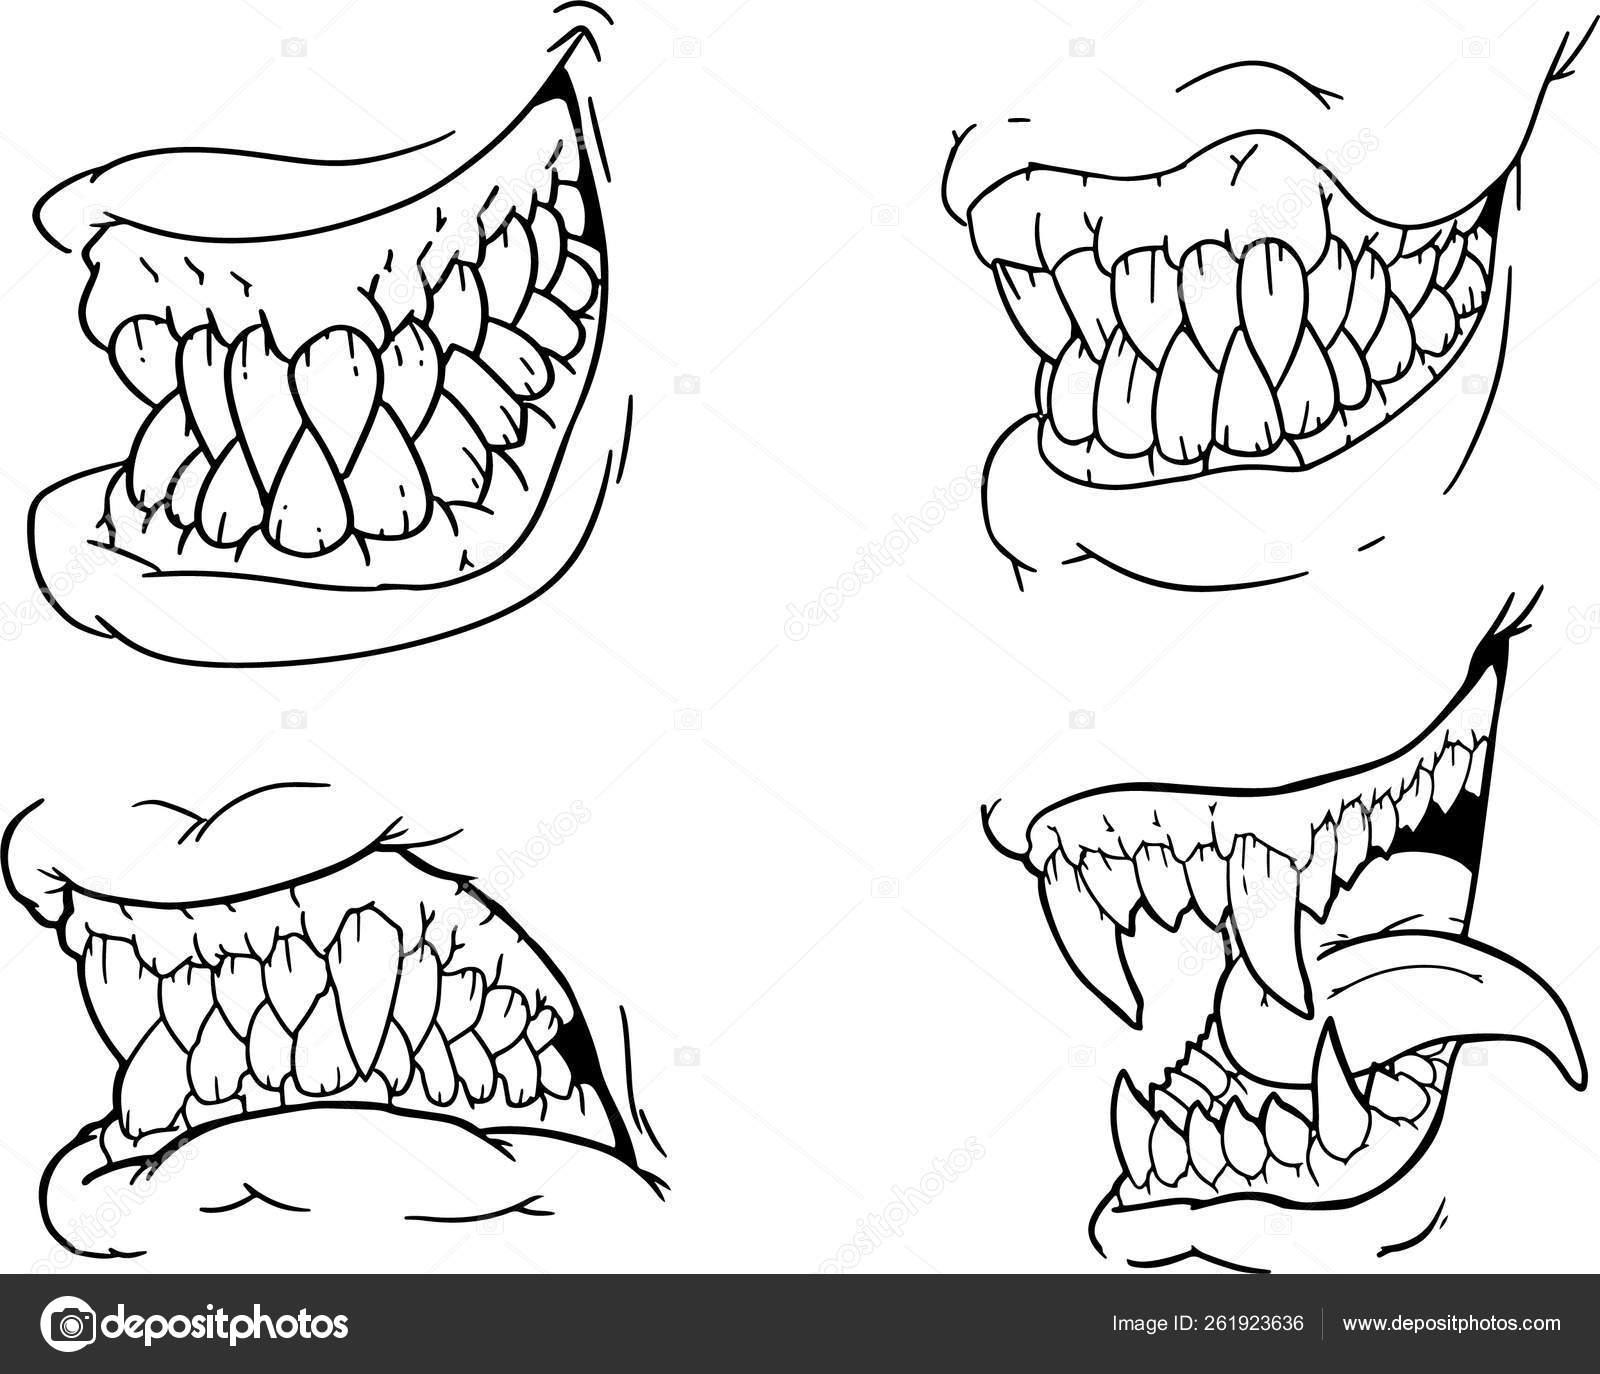 Hand Drawing Set Black White Scary Halloween Jaws Canines Teeth Stock Vector C Black Rhino 261923636